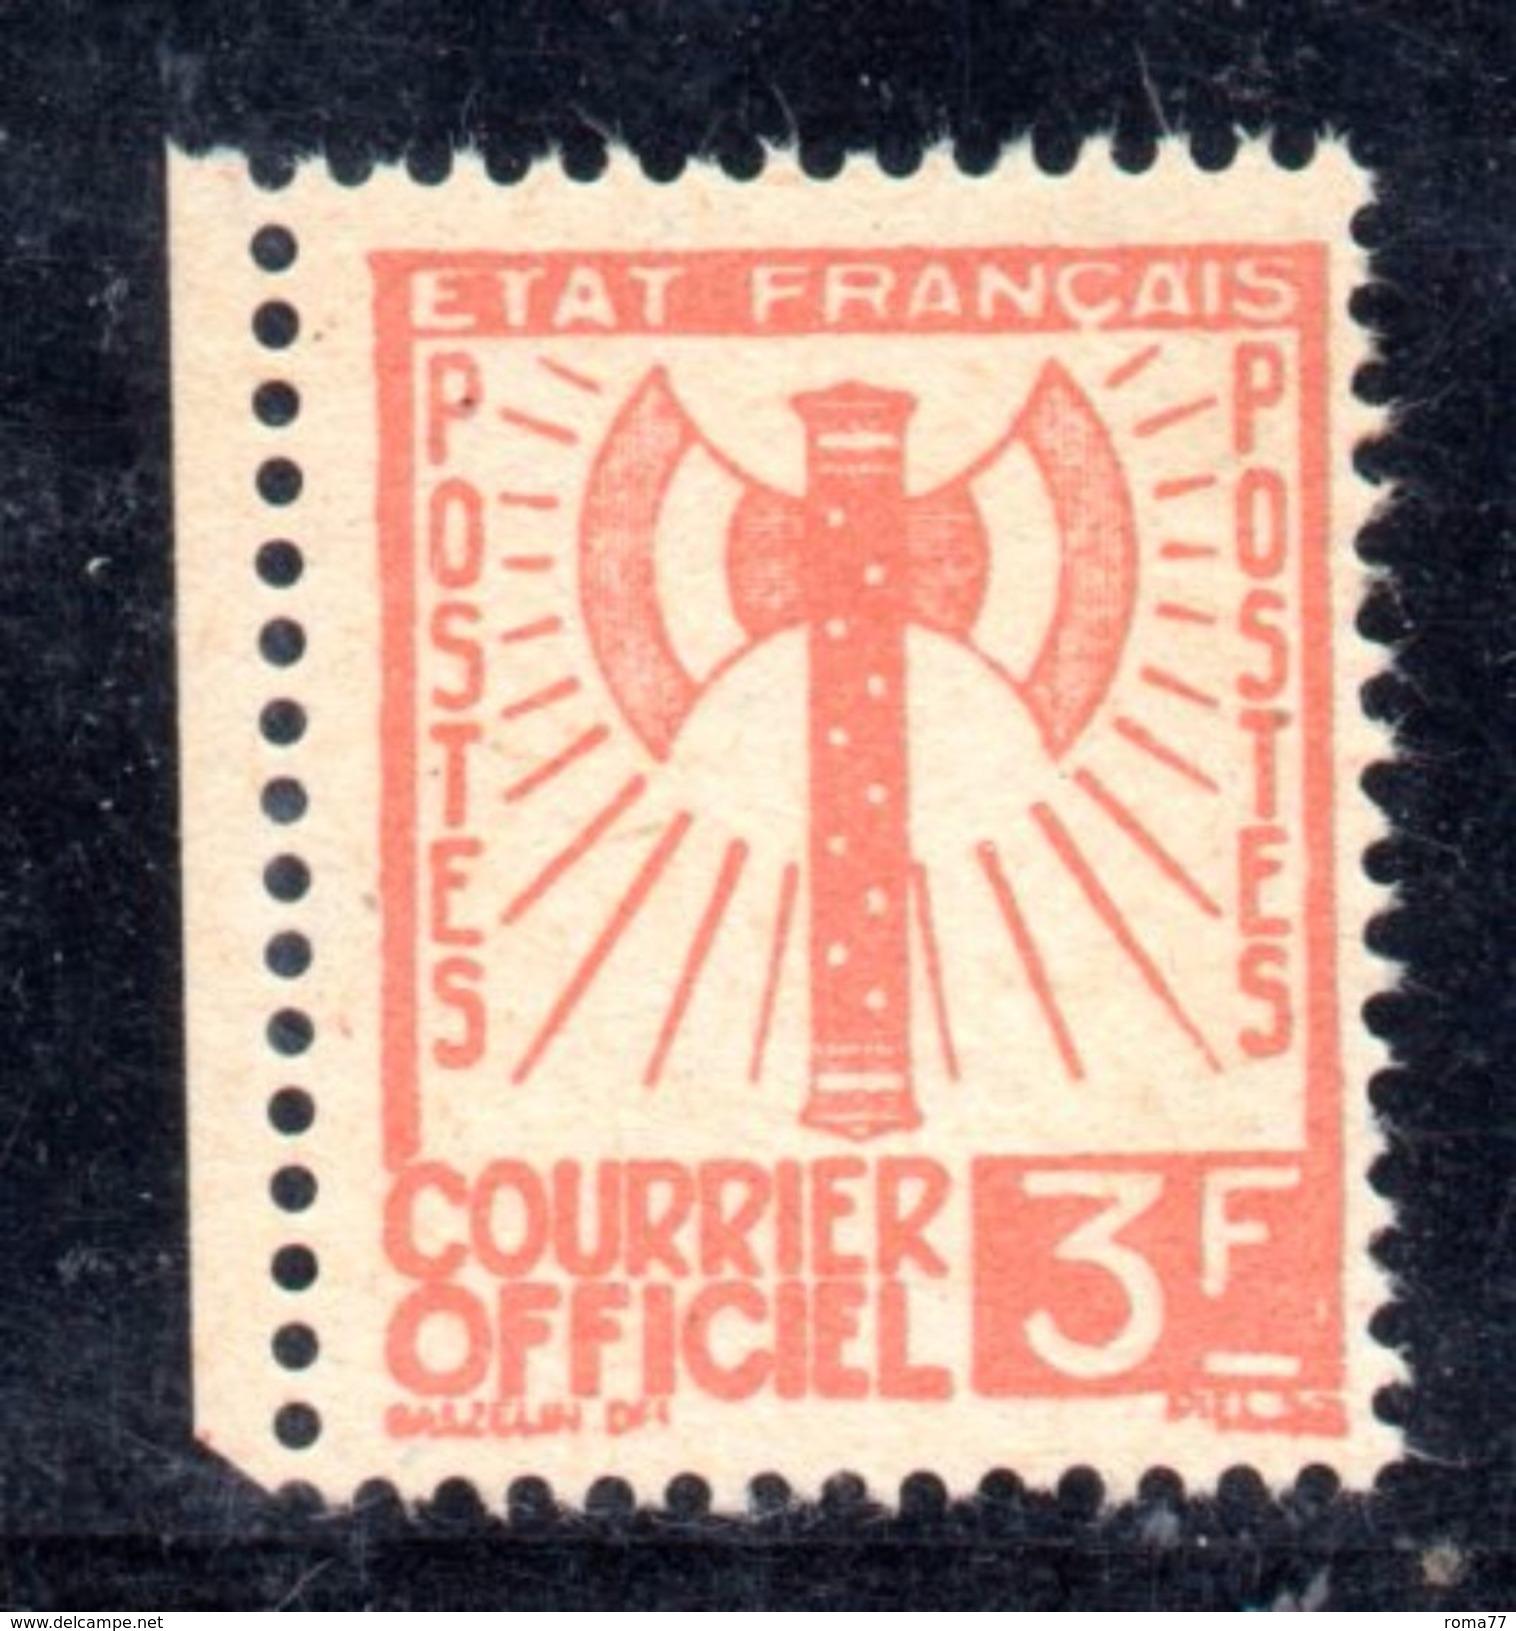 XP1582 - FRANCE Francia - 1943 - COURRIER OFFICIEL, Yvert  10 , 3 Franco Senza Gomma - Servizio